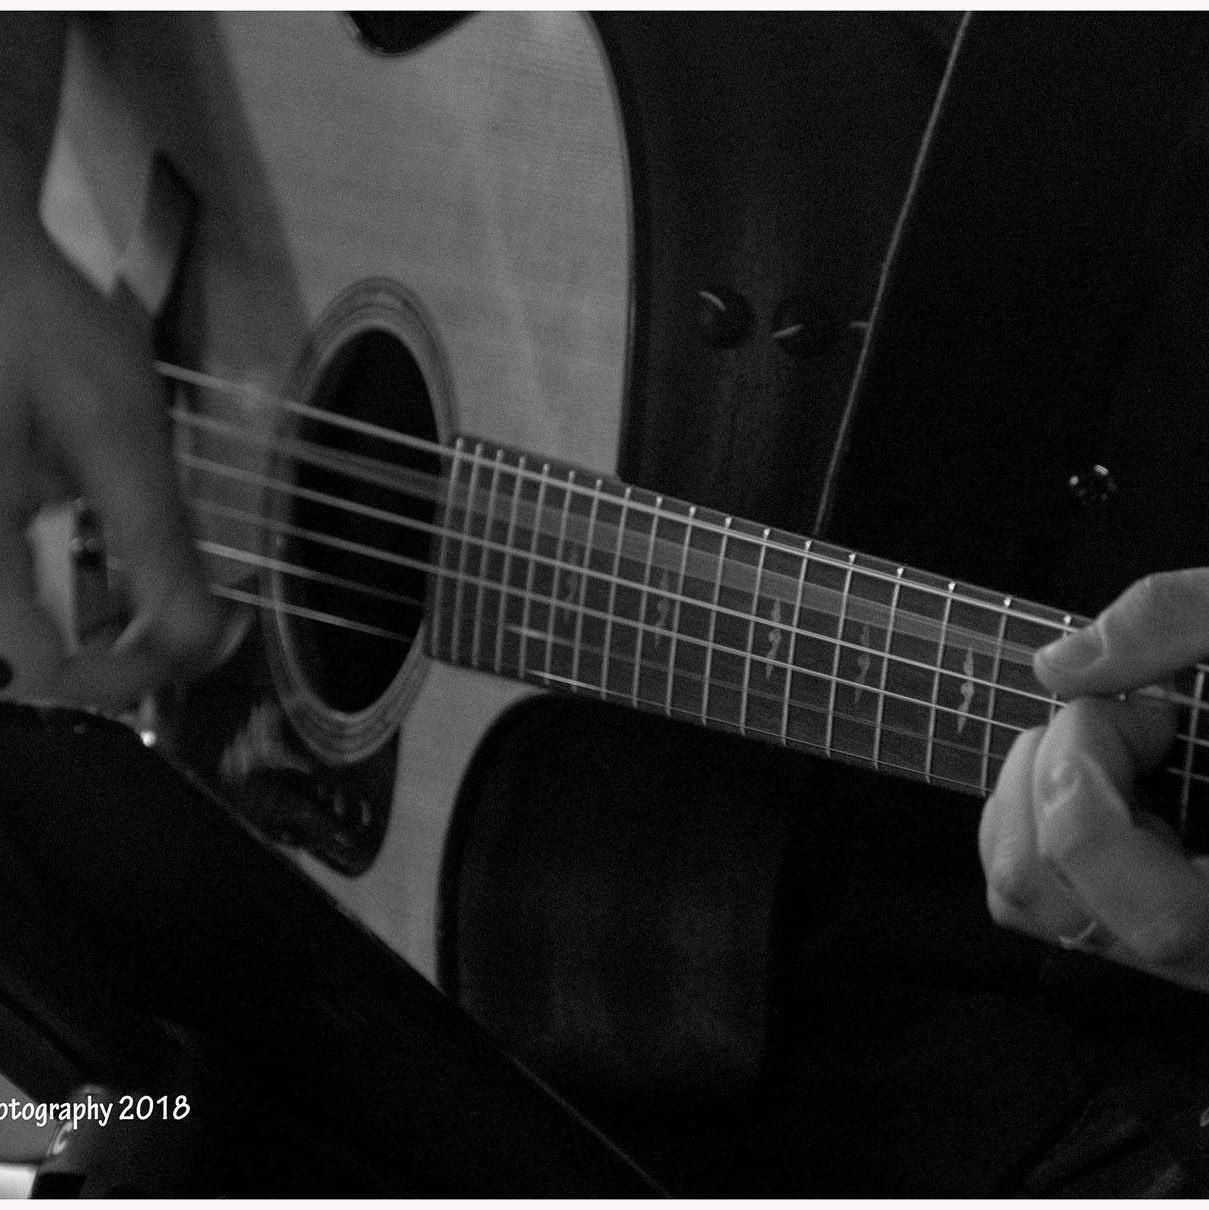 Mr. G playing guitar.